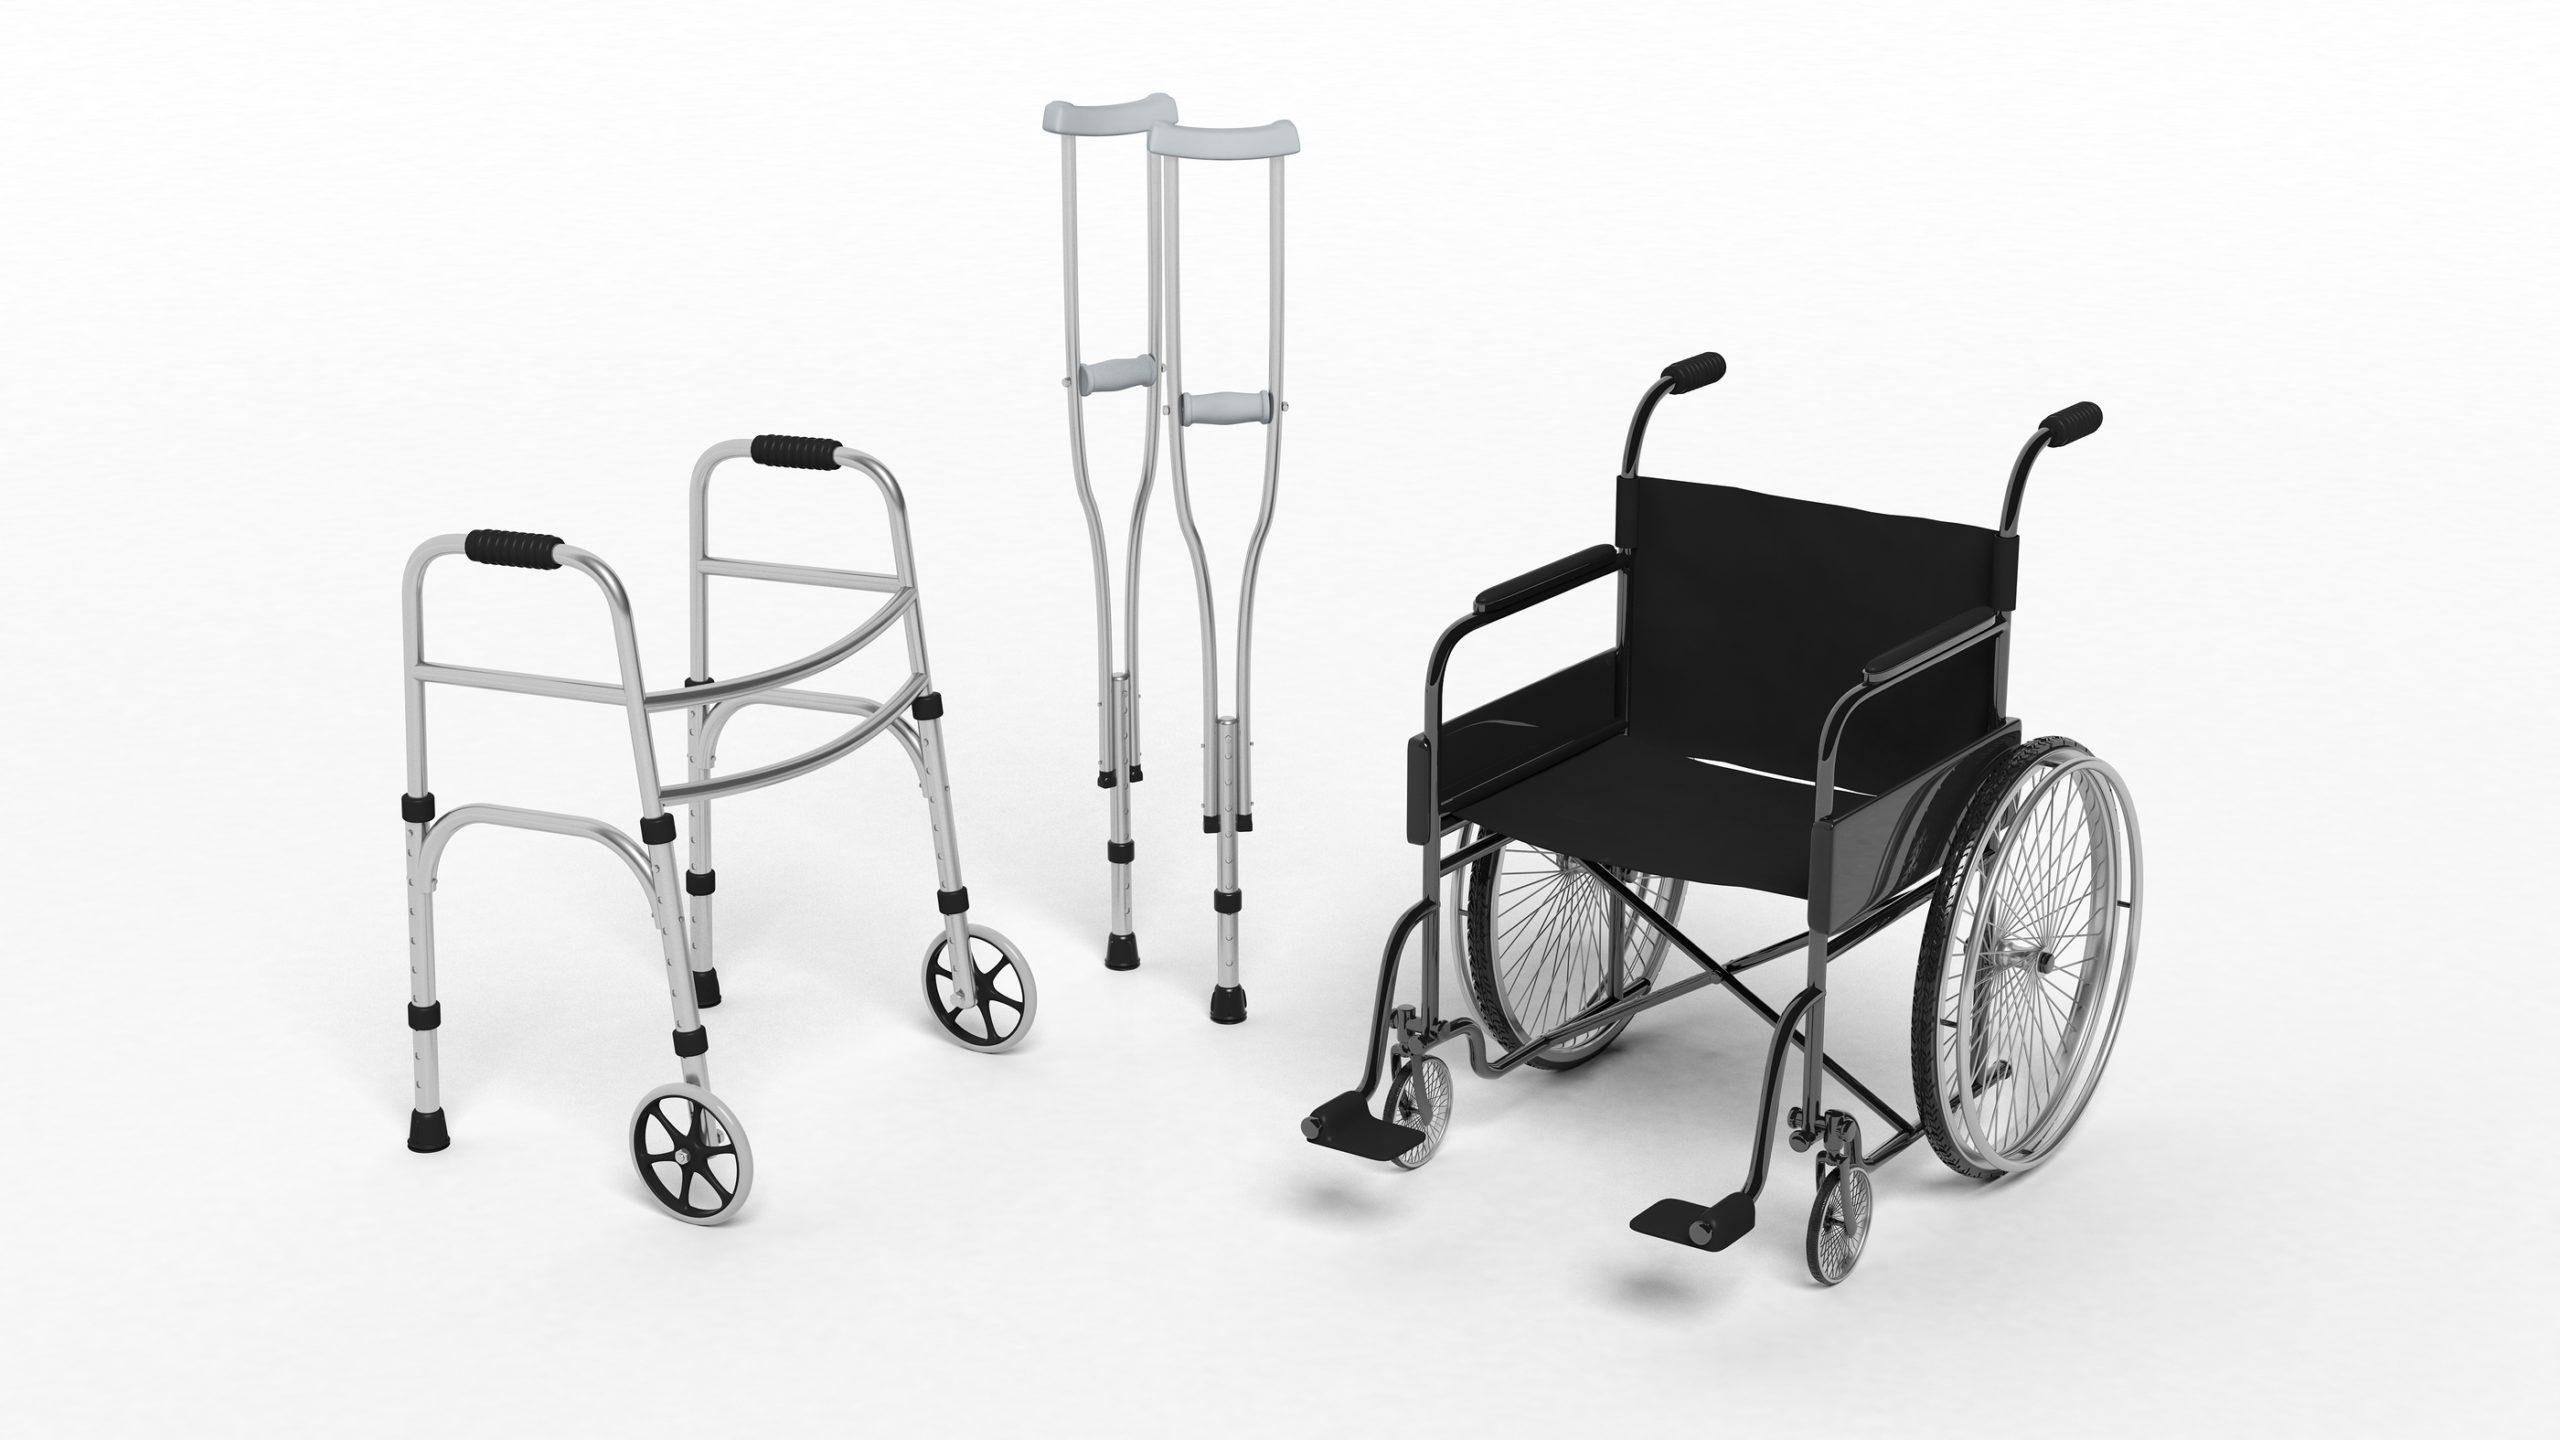 Walker, set of crutches, wheelchair